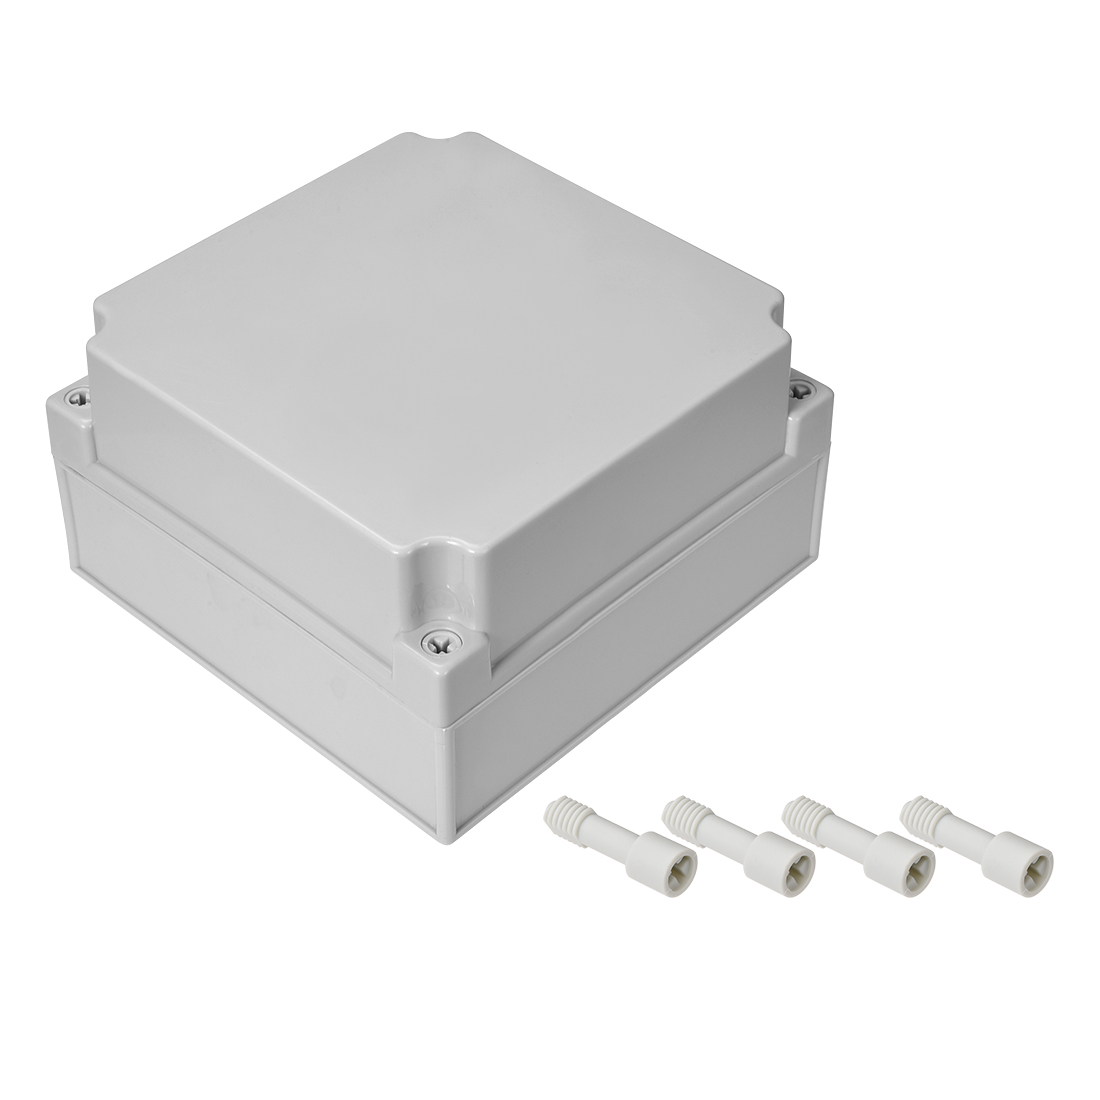 175mm x 175mm x 100mm Dustproof IP65 Junction Box DIY Case Enclosure Gray